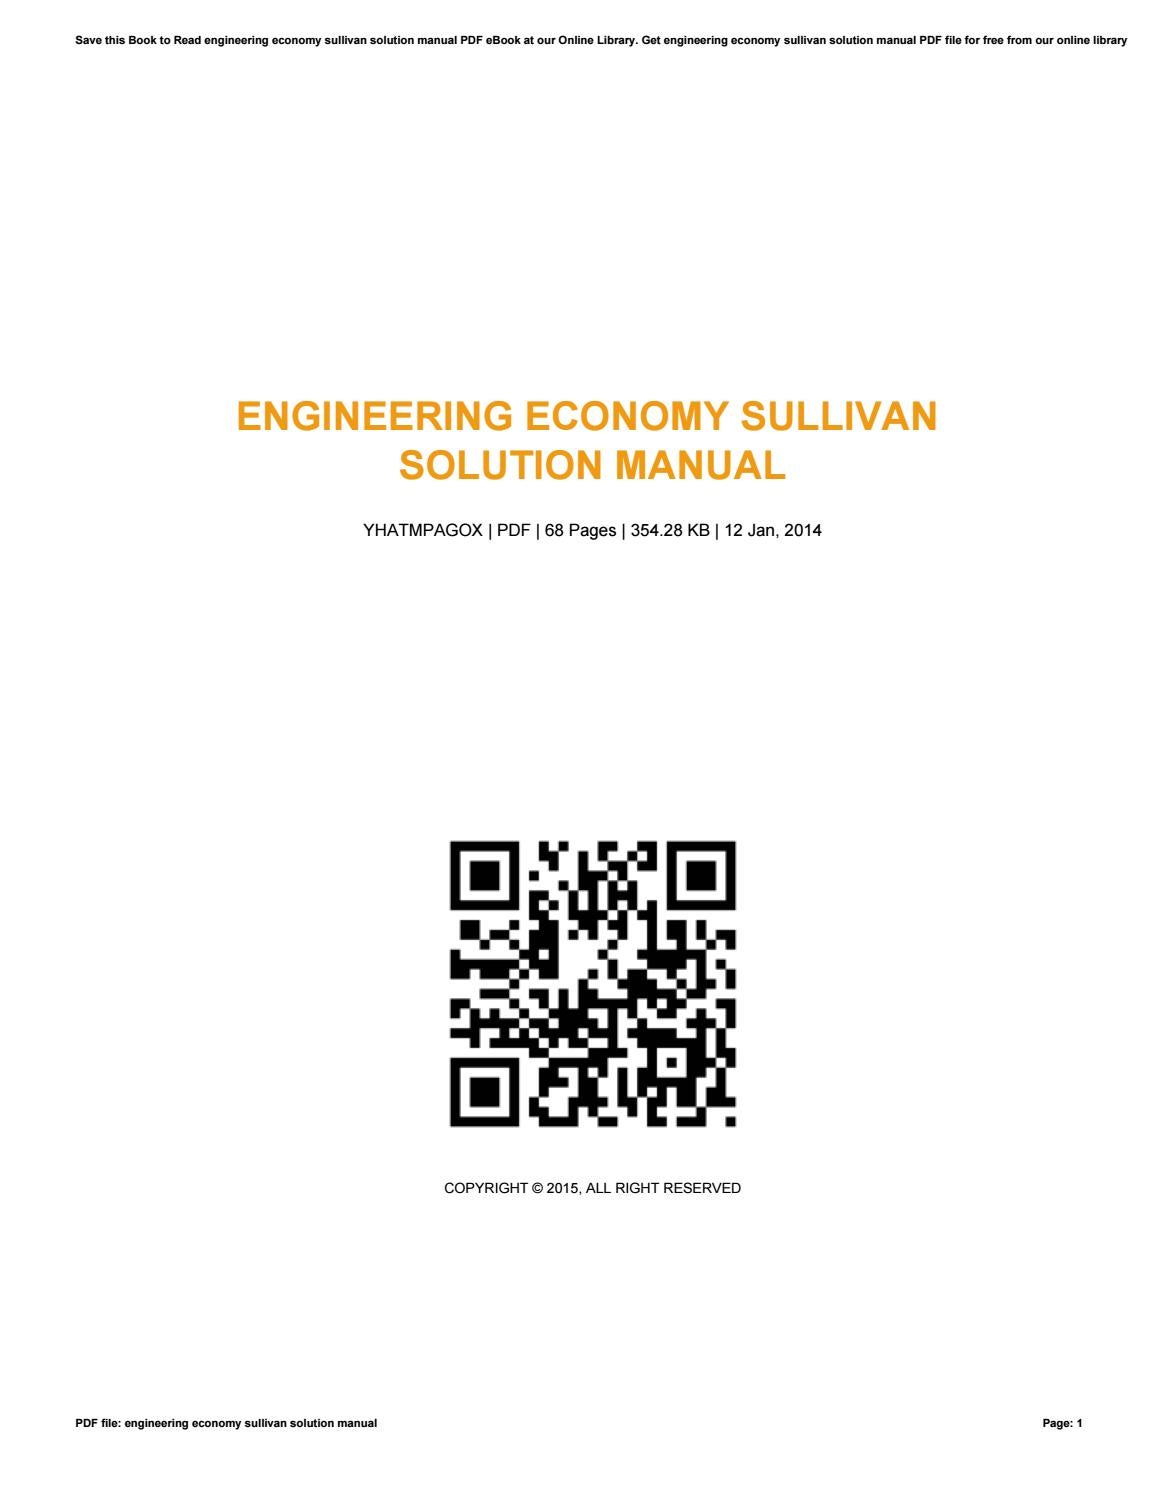 engineering economy sullivan solution manual by marycarr4550 issuu rh issuu com engineering economy sullivan 16th edition solution manual engineering economy sullivan 16th edition solution manual pdf